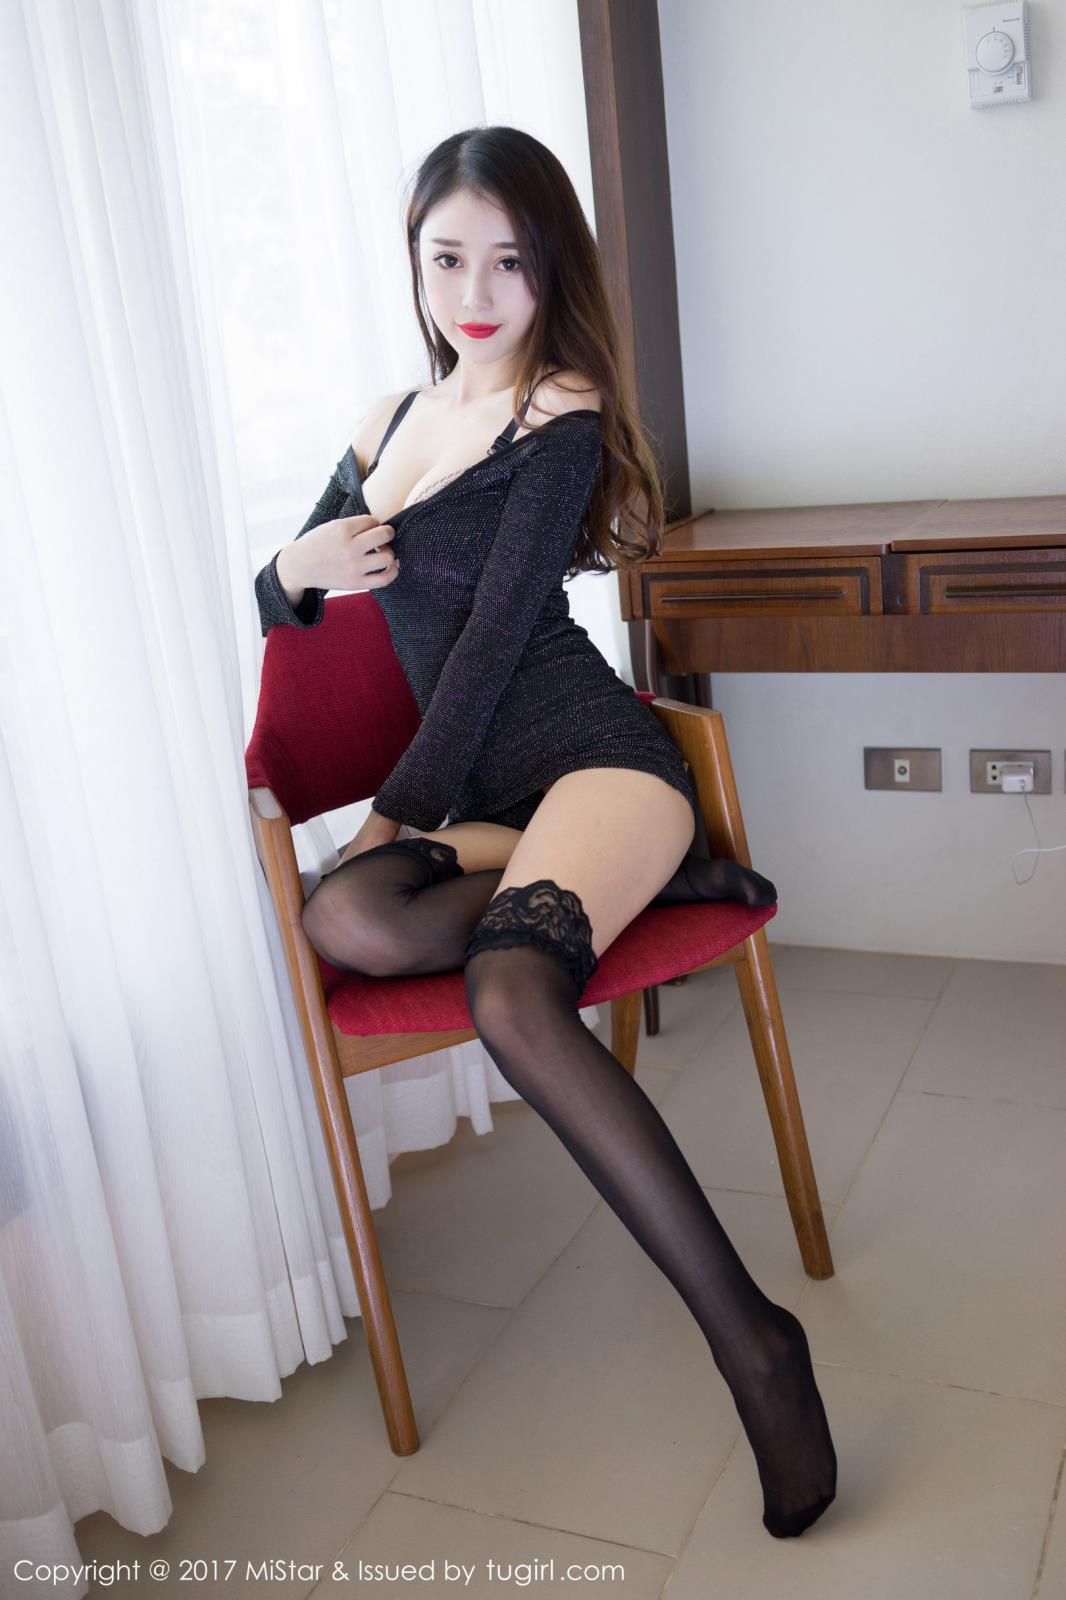 MiStar魅妍社宅男女神赵小米Kitty黑丝美腿苏梅岛旅拍